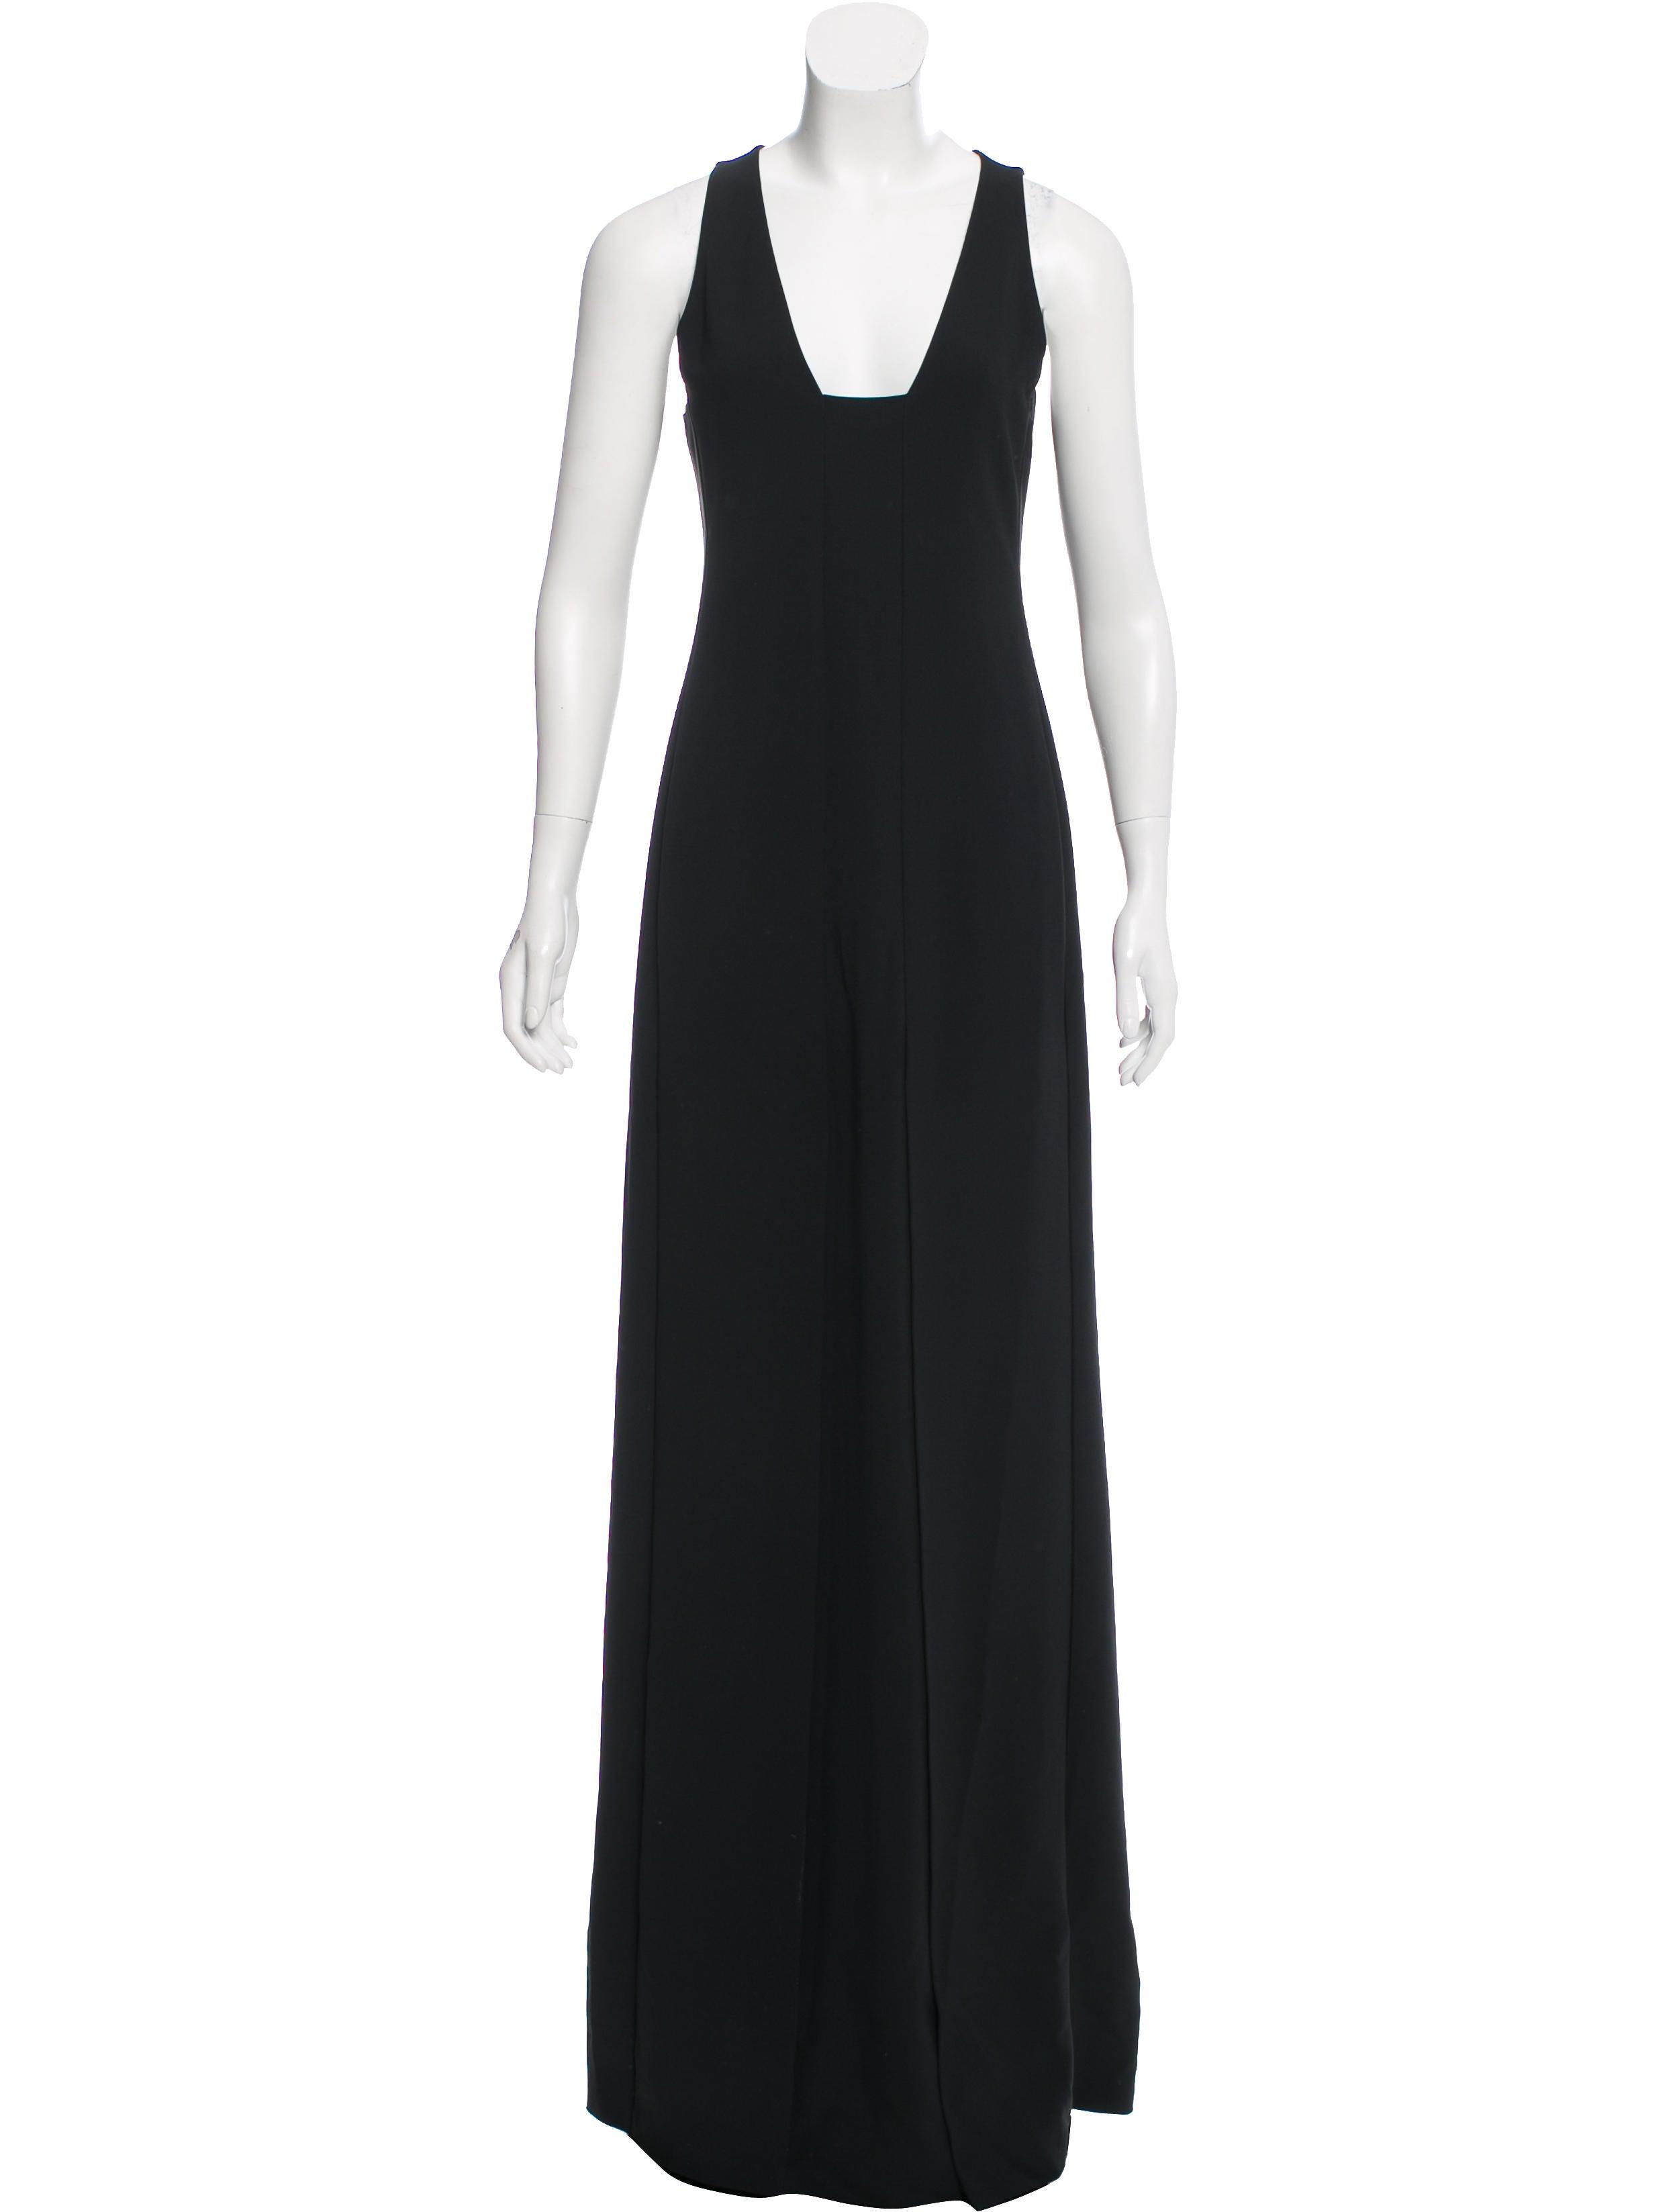 Calvin Klein Collection Sleeveless Evening Dress - Clothing ...